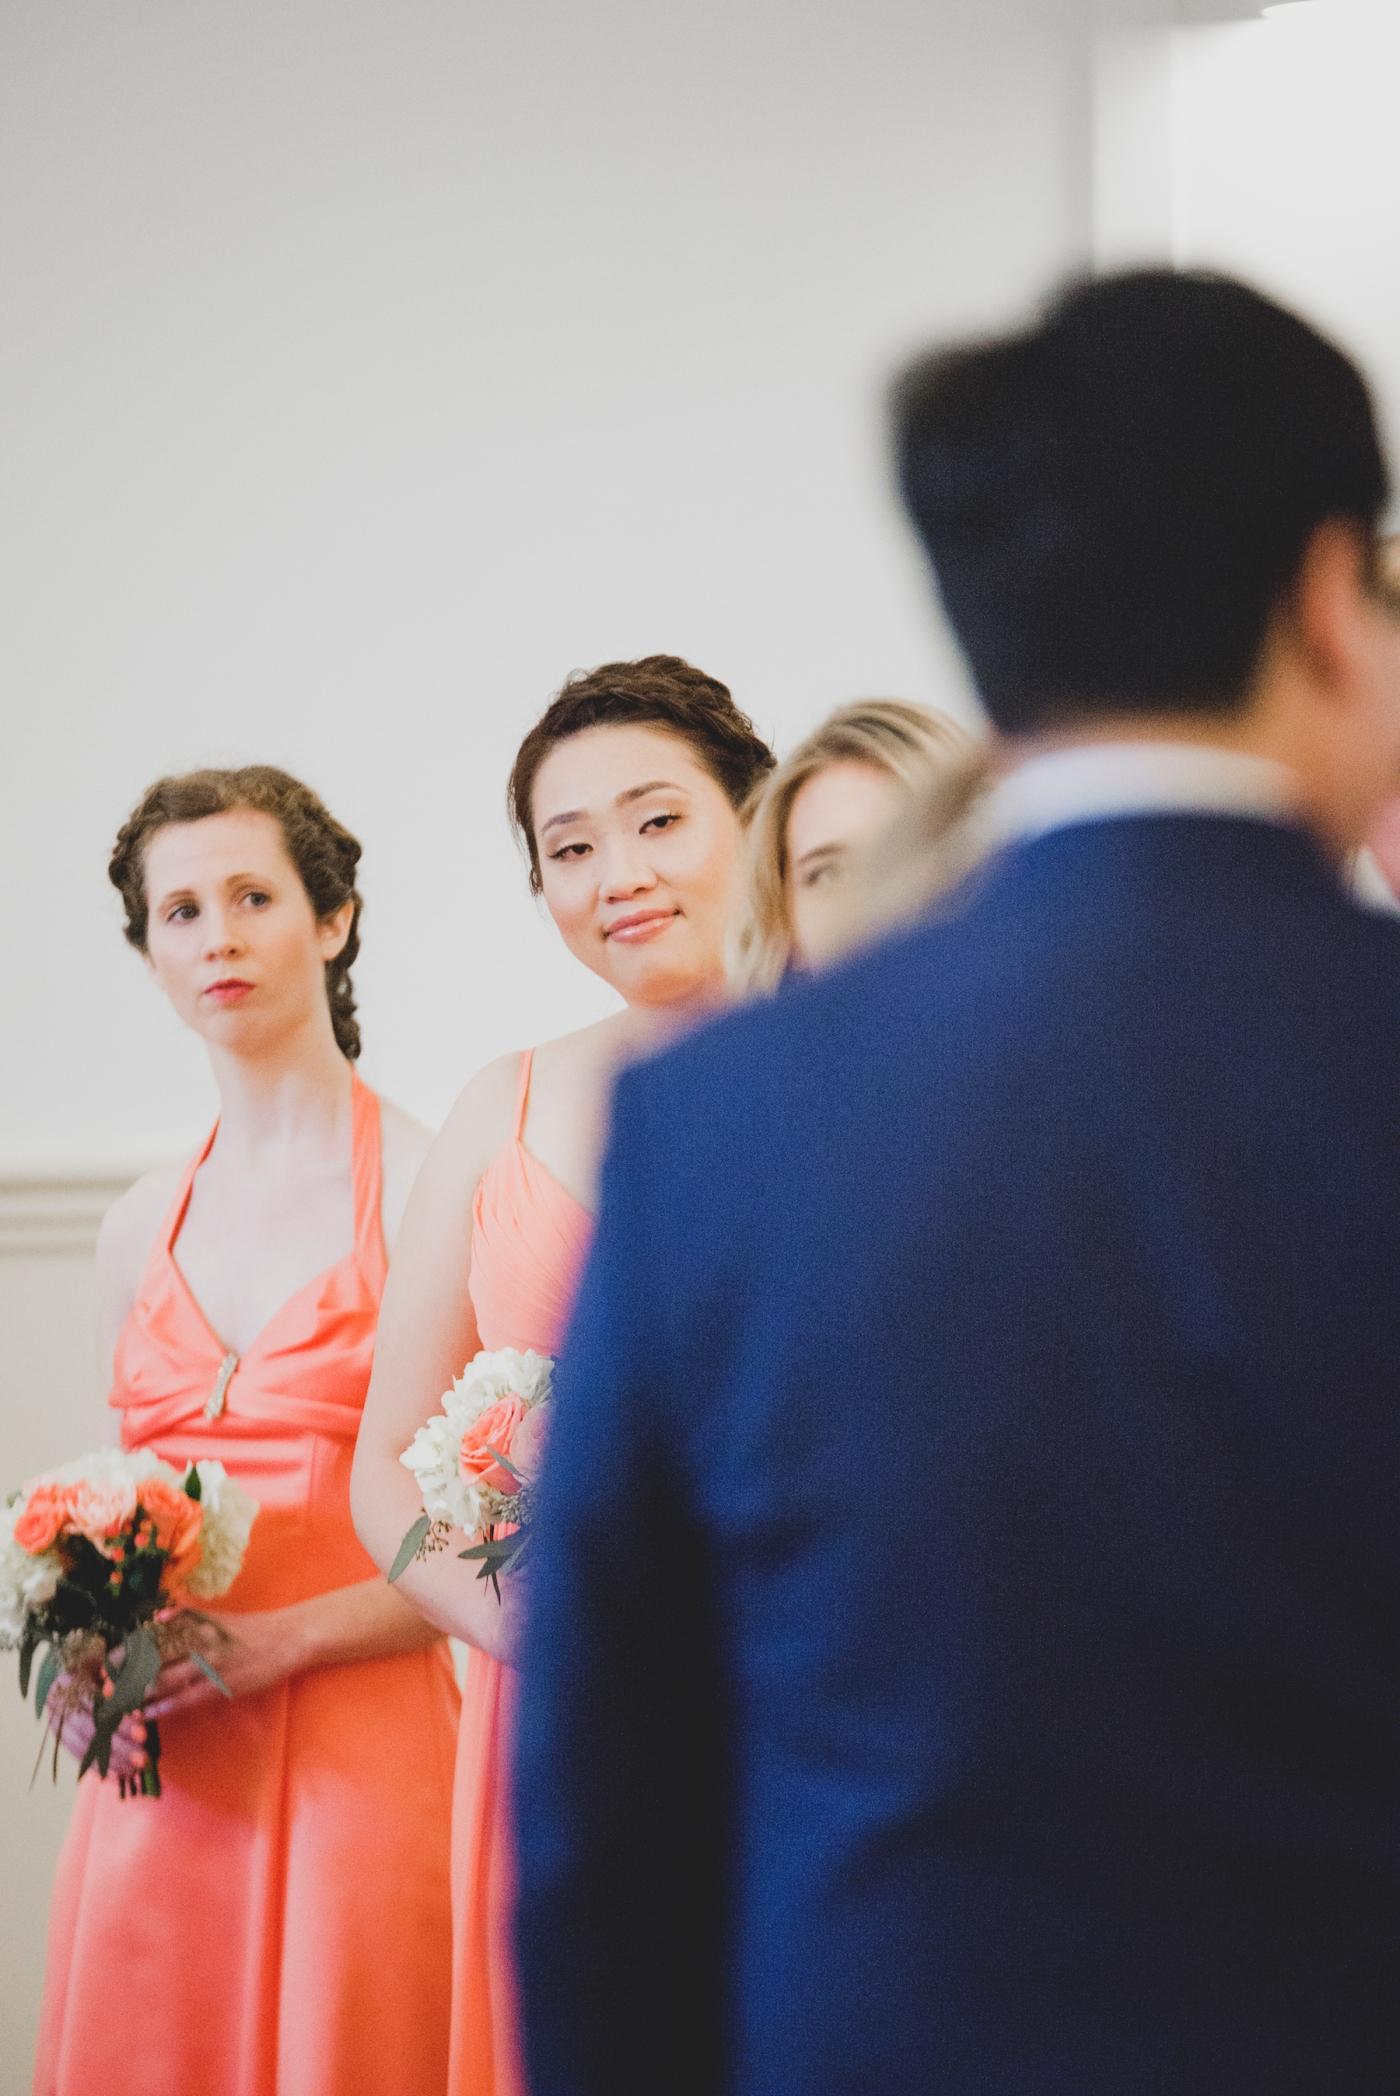 DSC_2625Everett_Wedding_Ballroom_Jane_Speleers_photography_Rachel_and_Edmund_Ceremony_2017